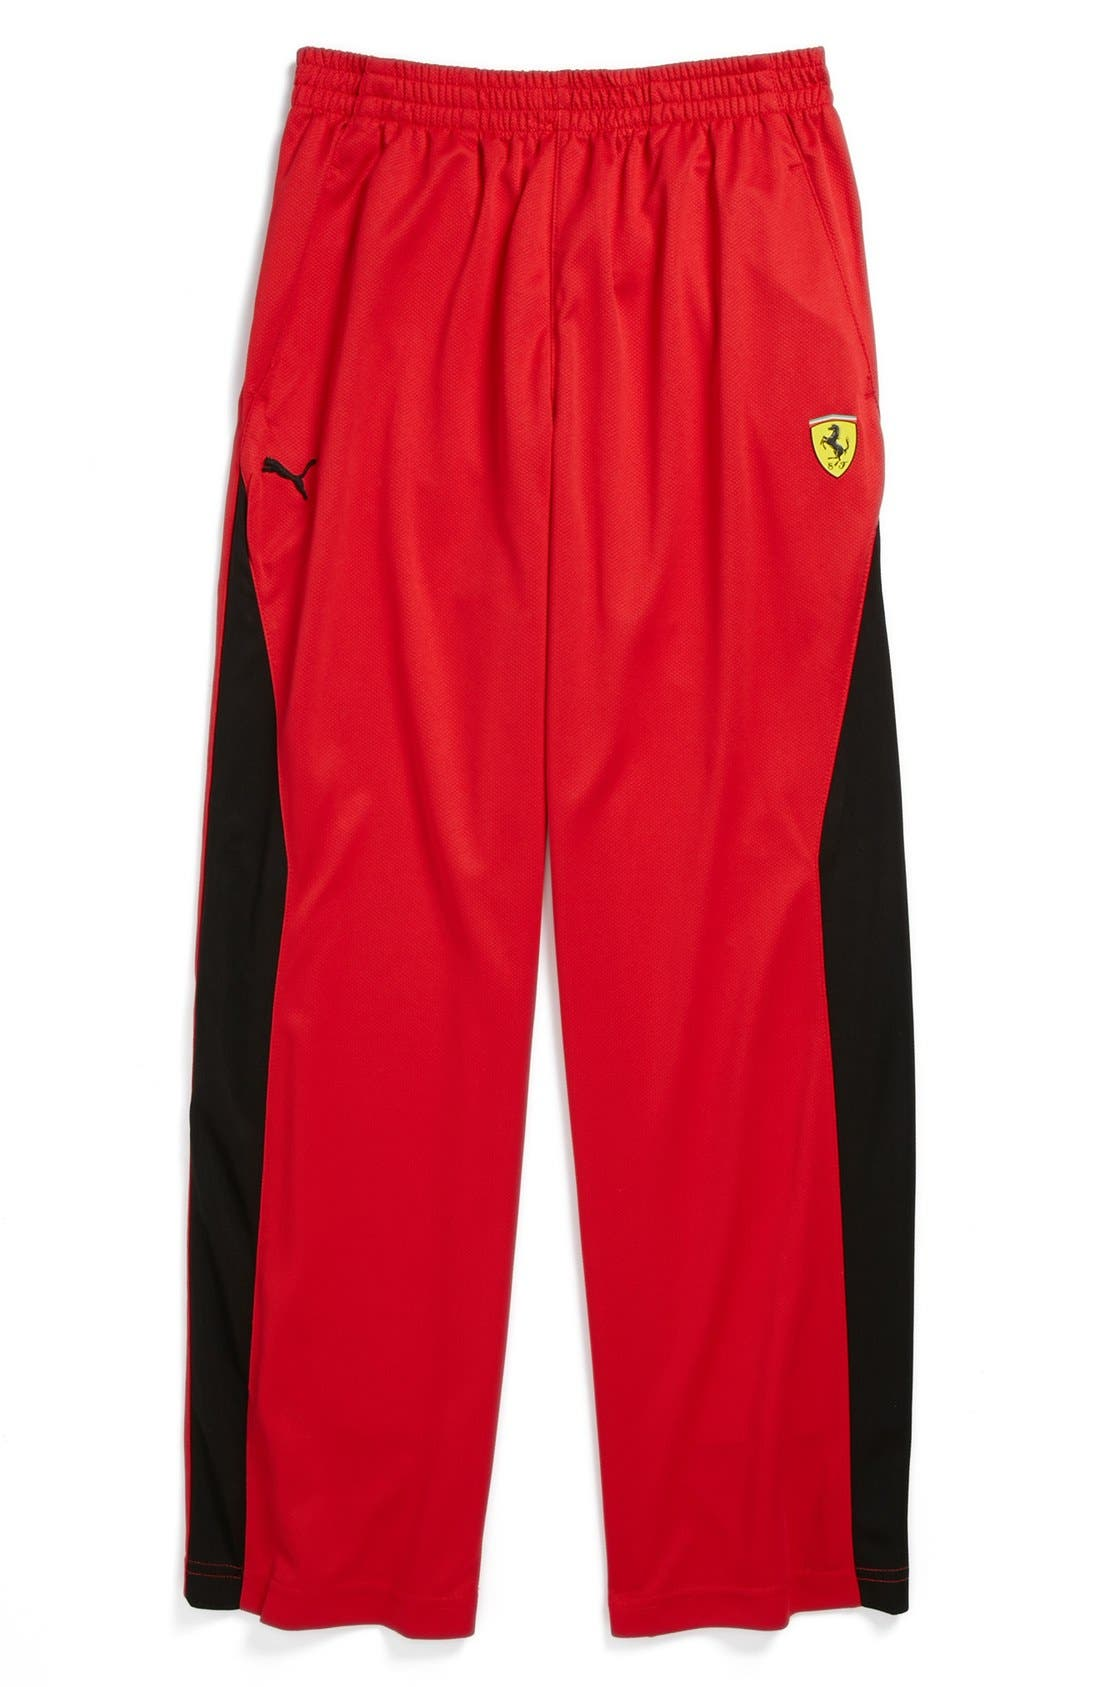 Alternate Image 1 Selected - PUMA 'Ferrari' Athletic Pants (Big Boys)